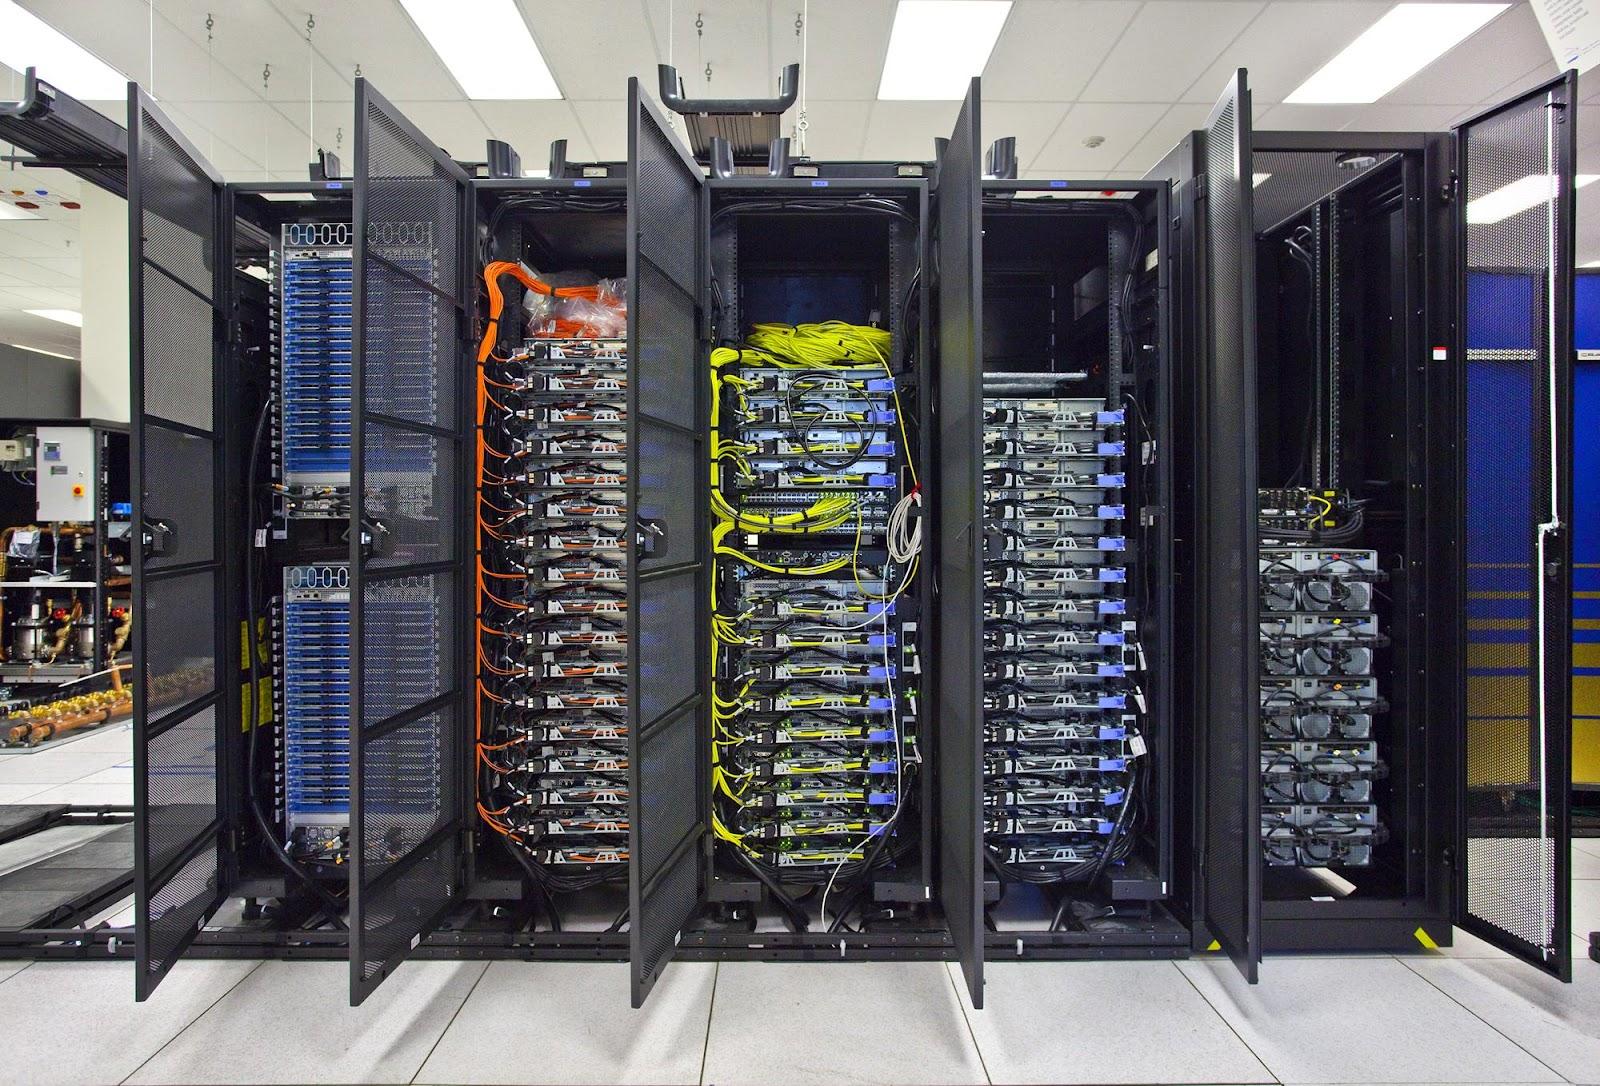 Medium level server farm